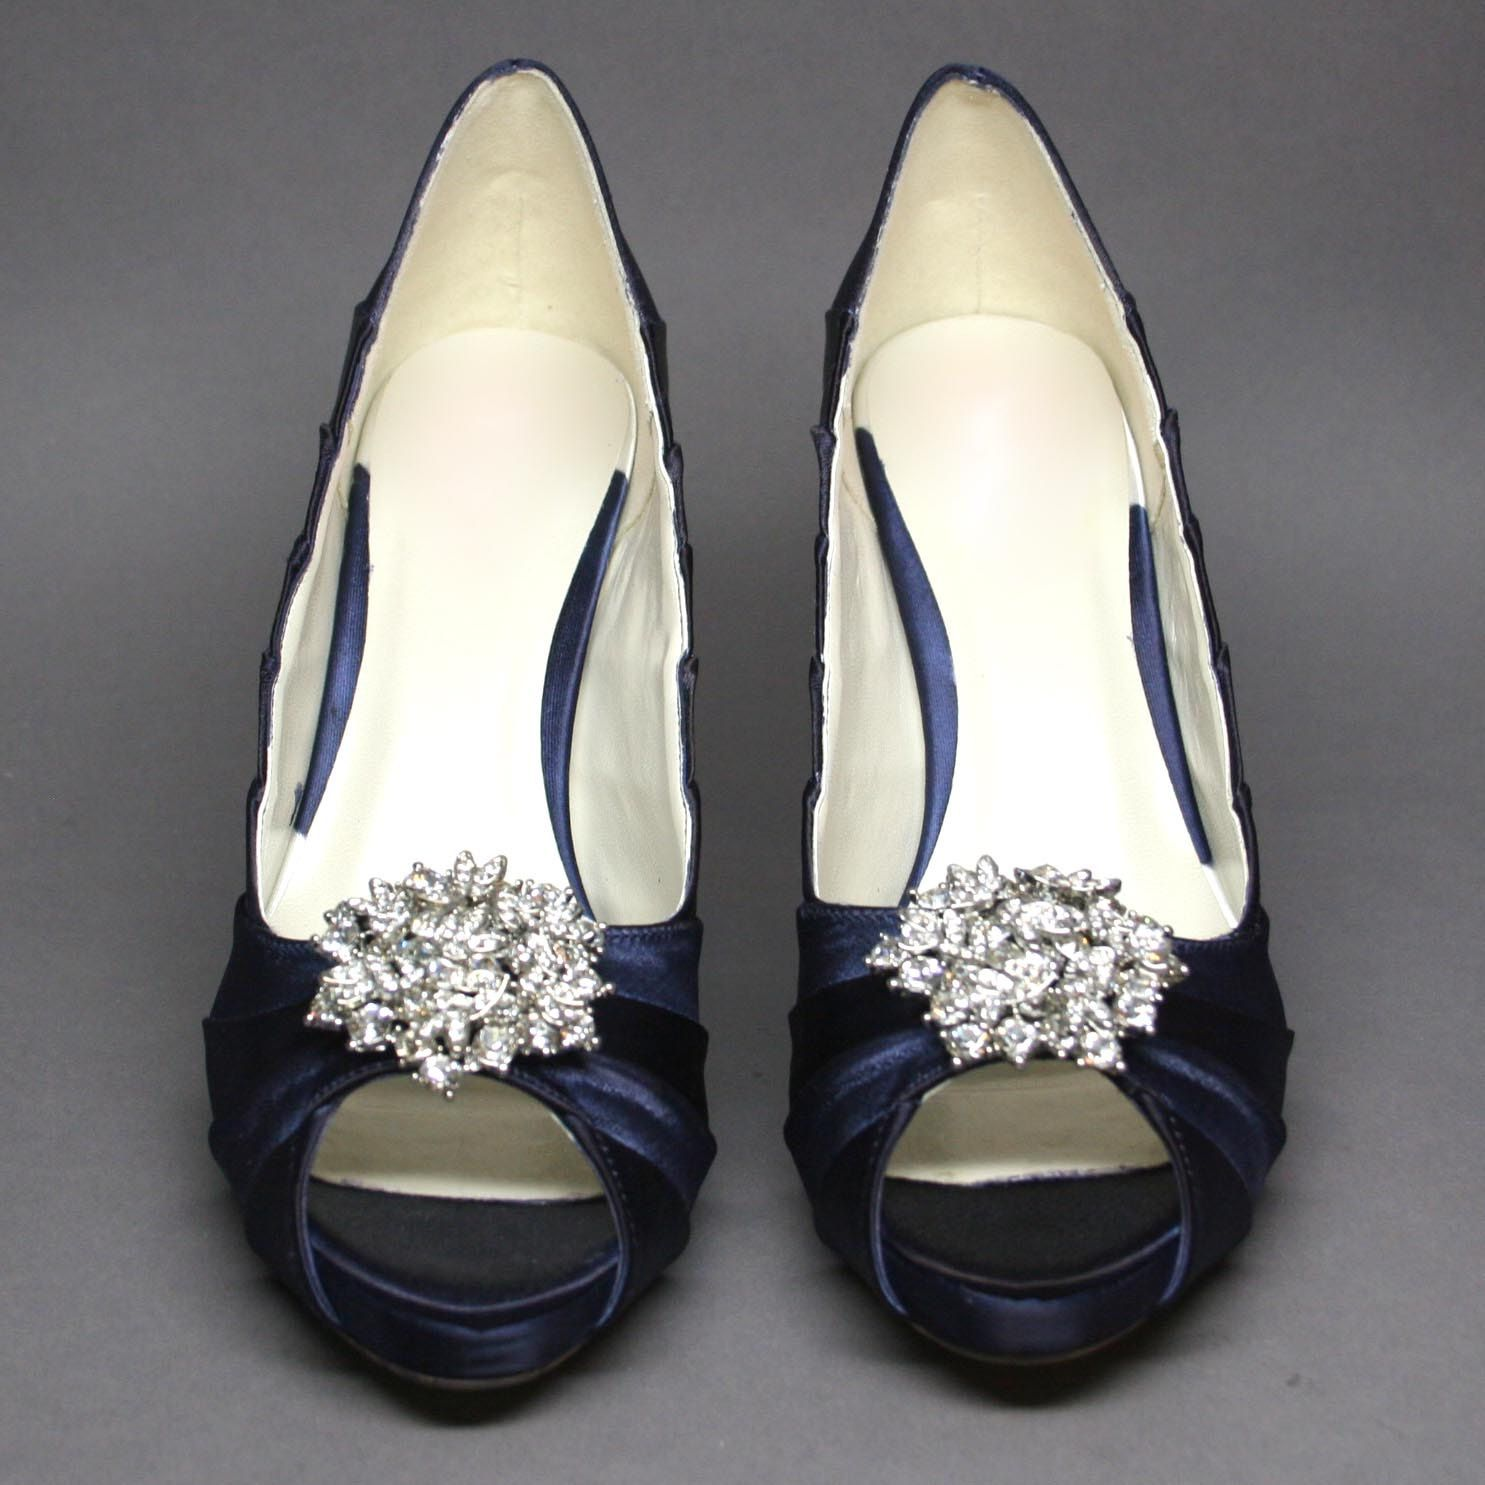 Custom Wedding Shoes Navy Blue Peeptoes With Silver Rhinestone Adornment 16500 Via